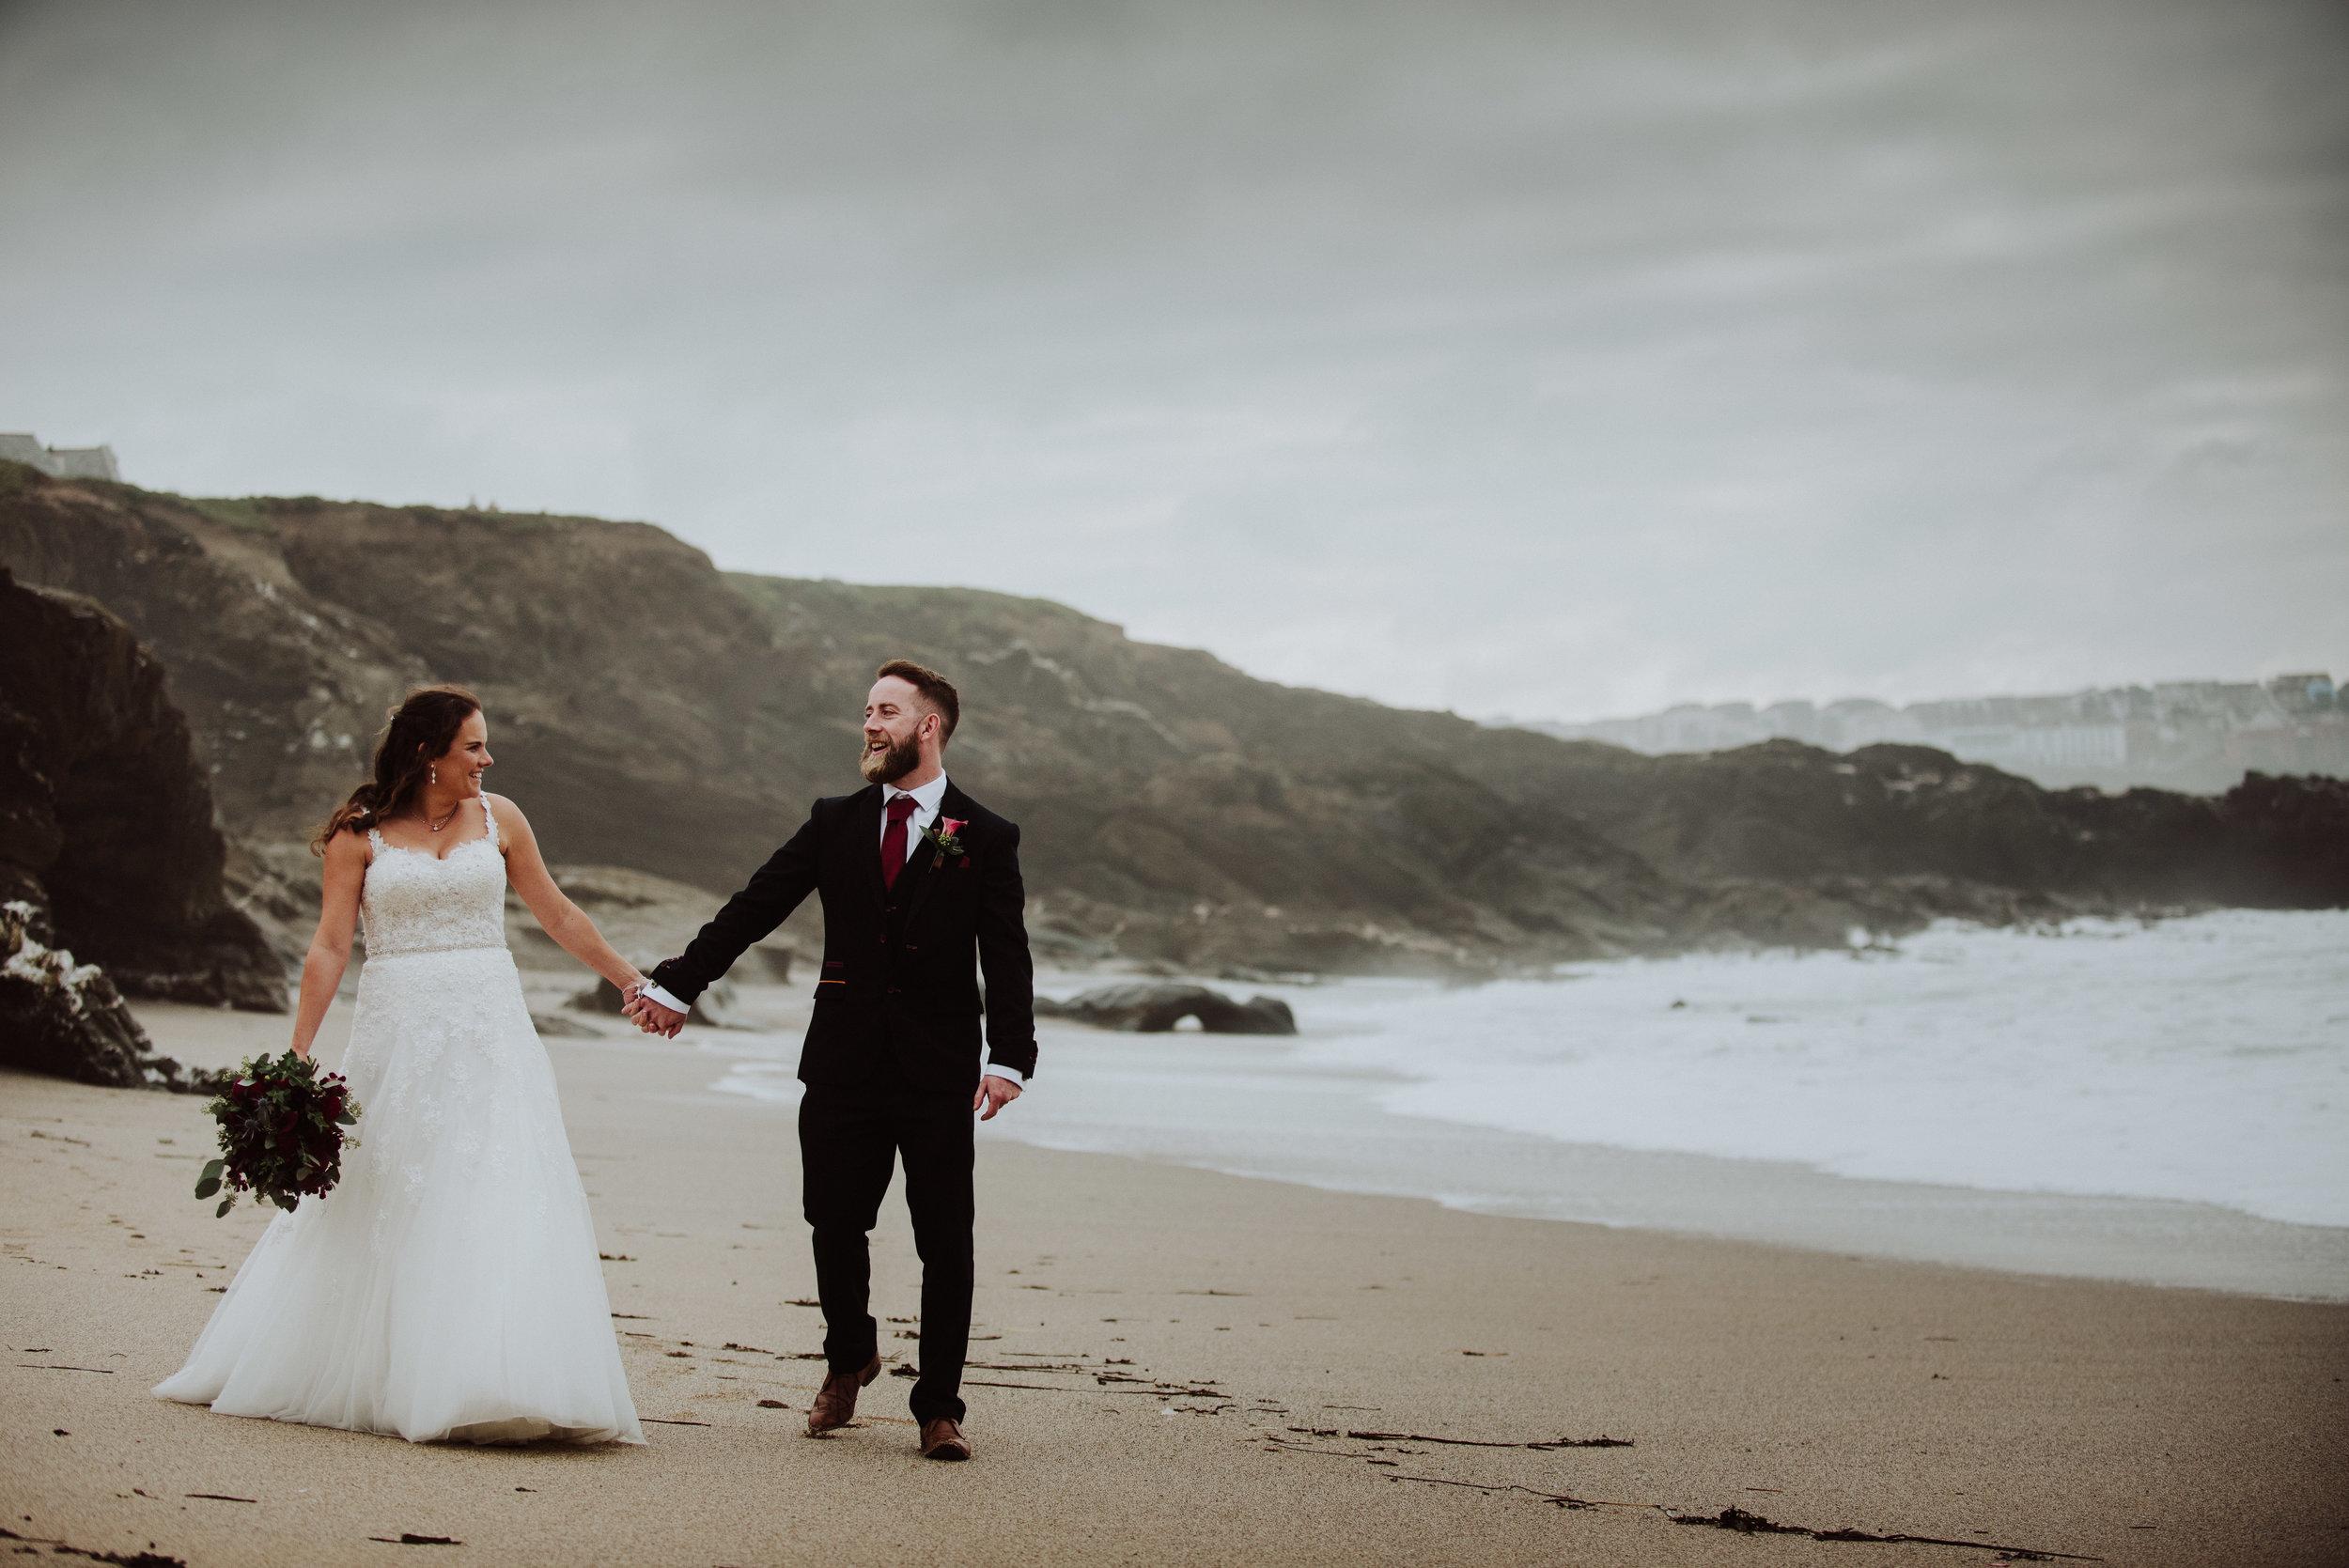 wedding-photographer-cornwall-carnmarth-hotel-newquay-3.jpg